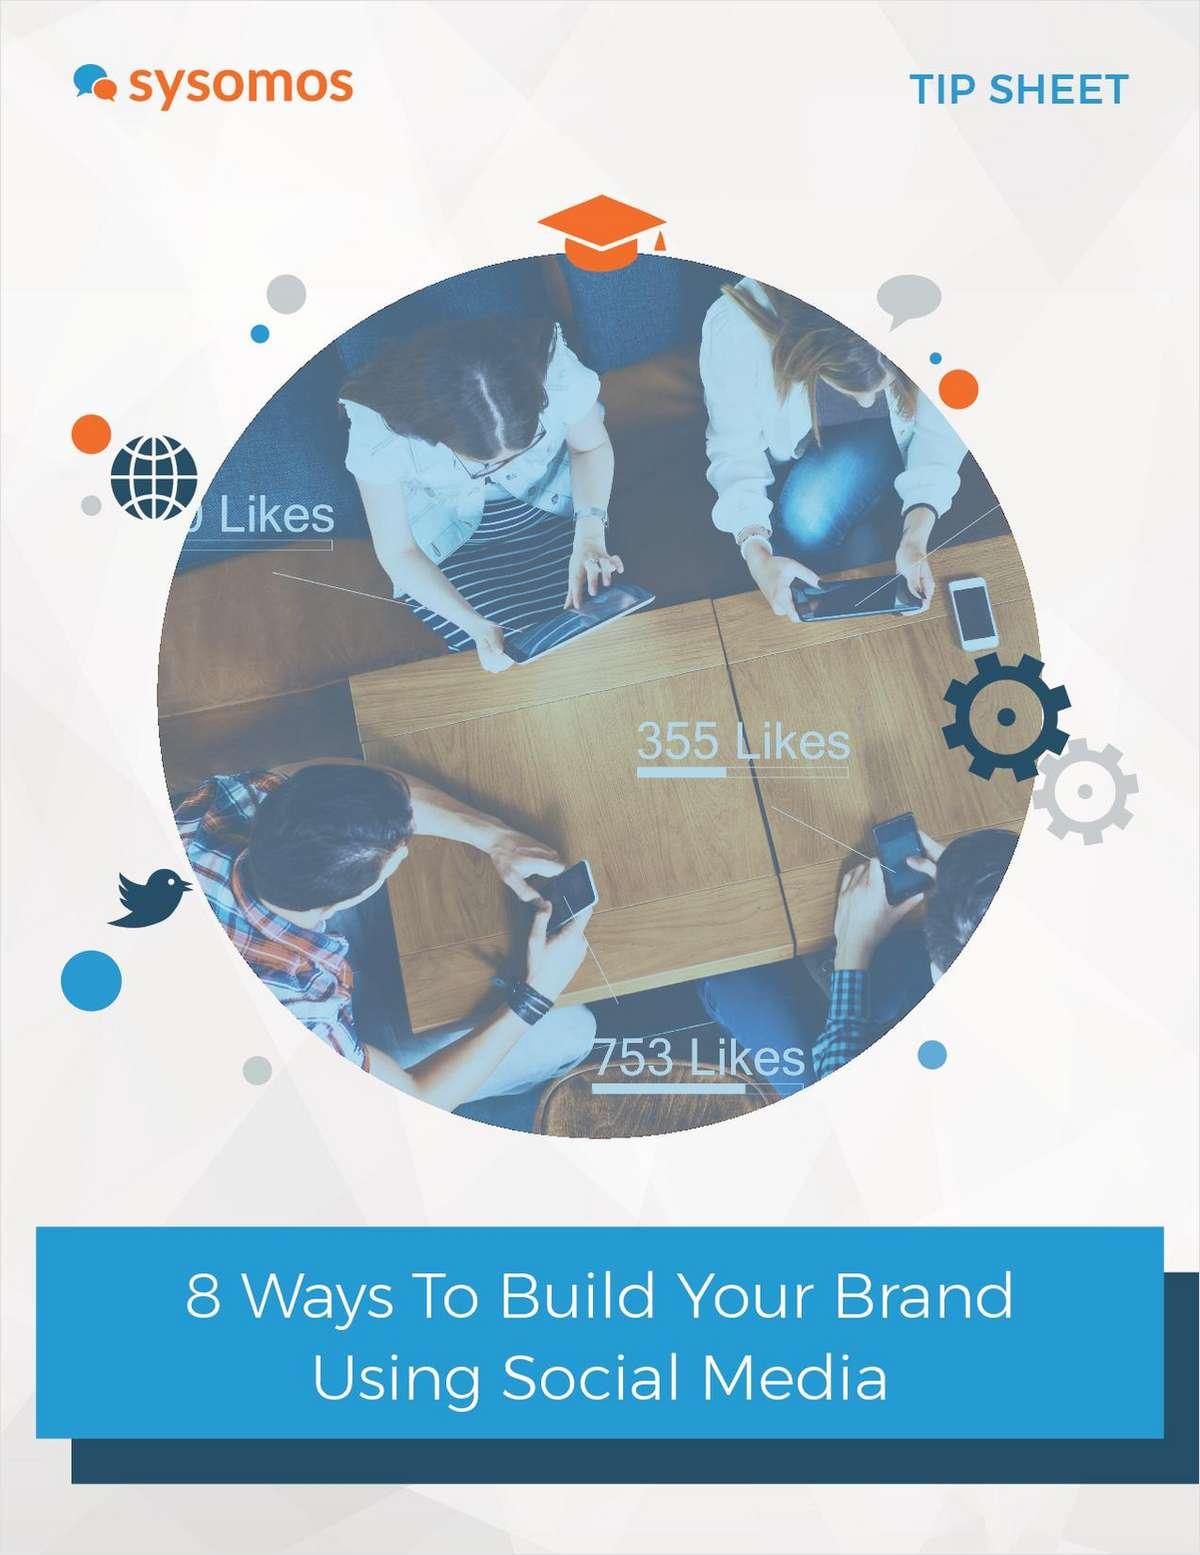 Building Your Brand Using Social Media